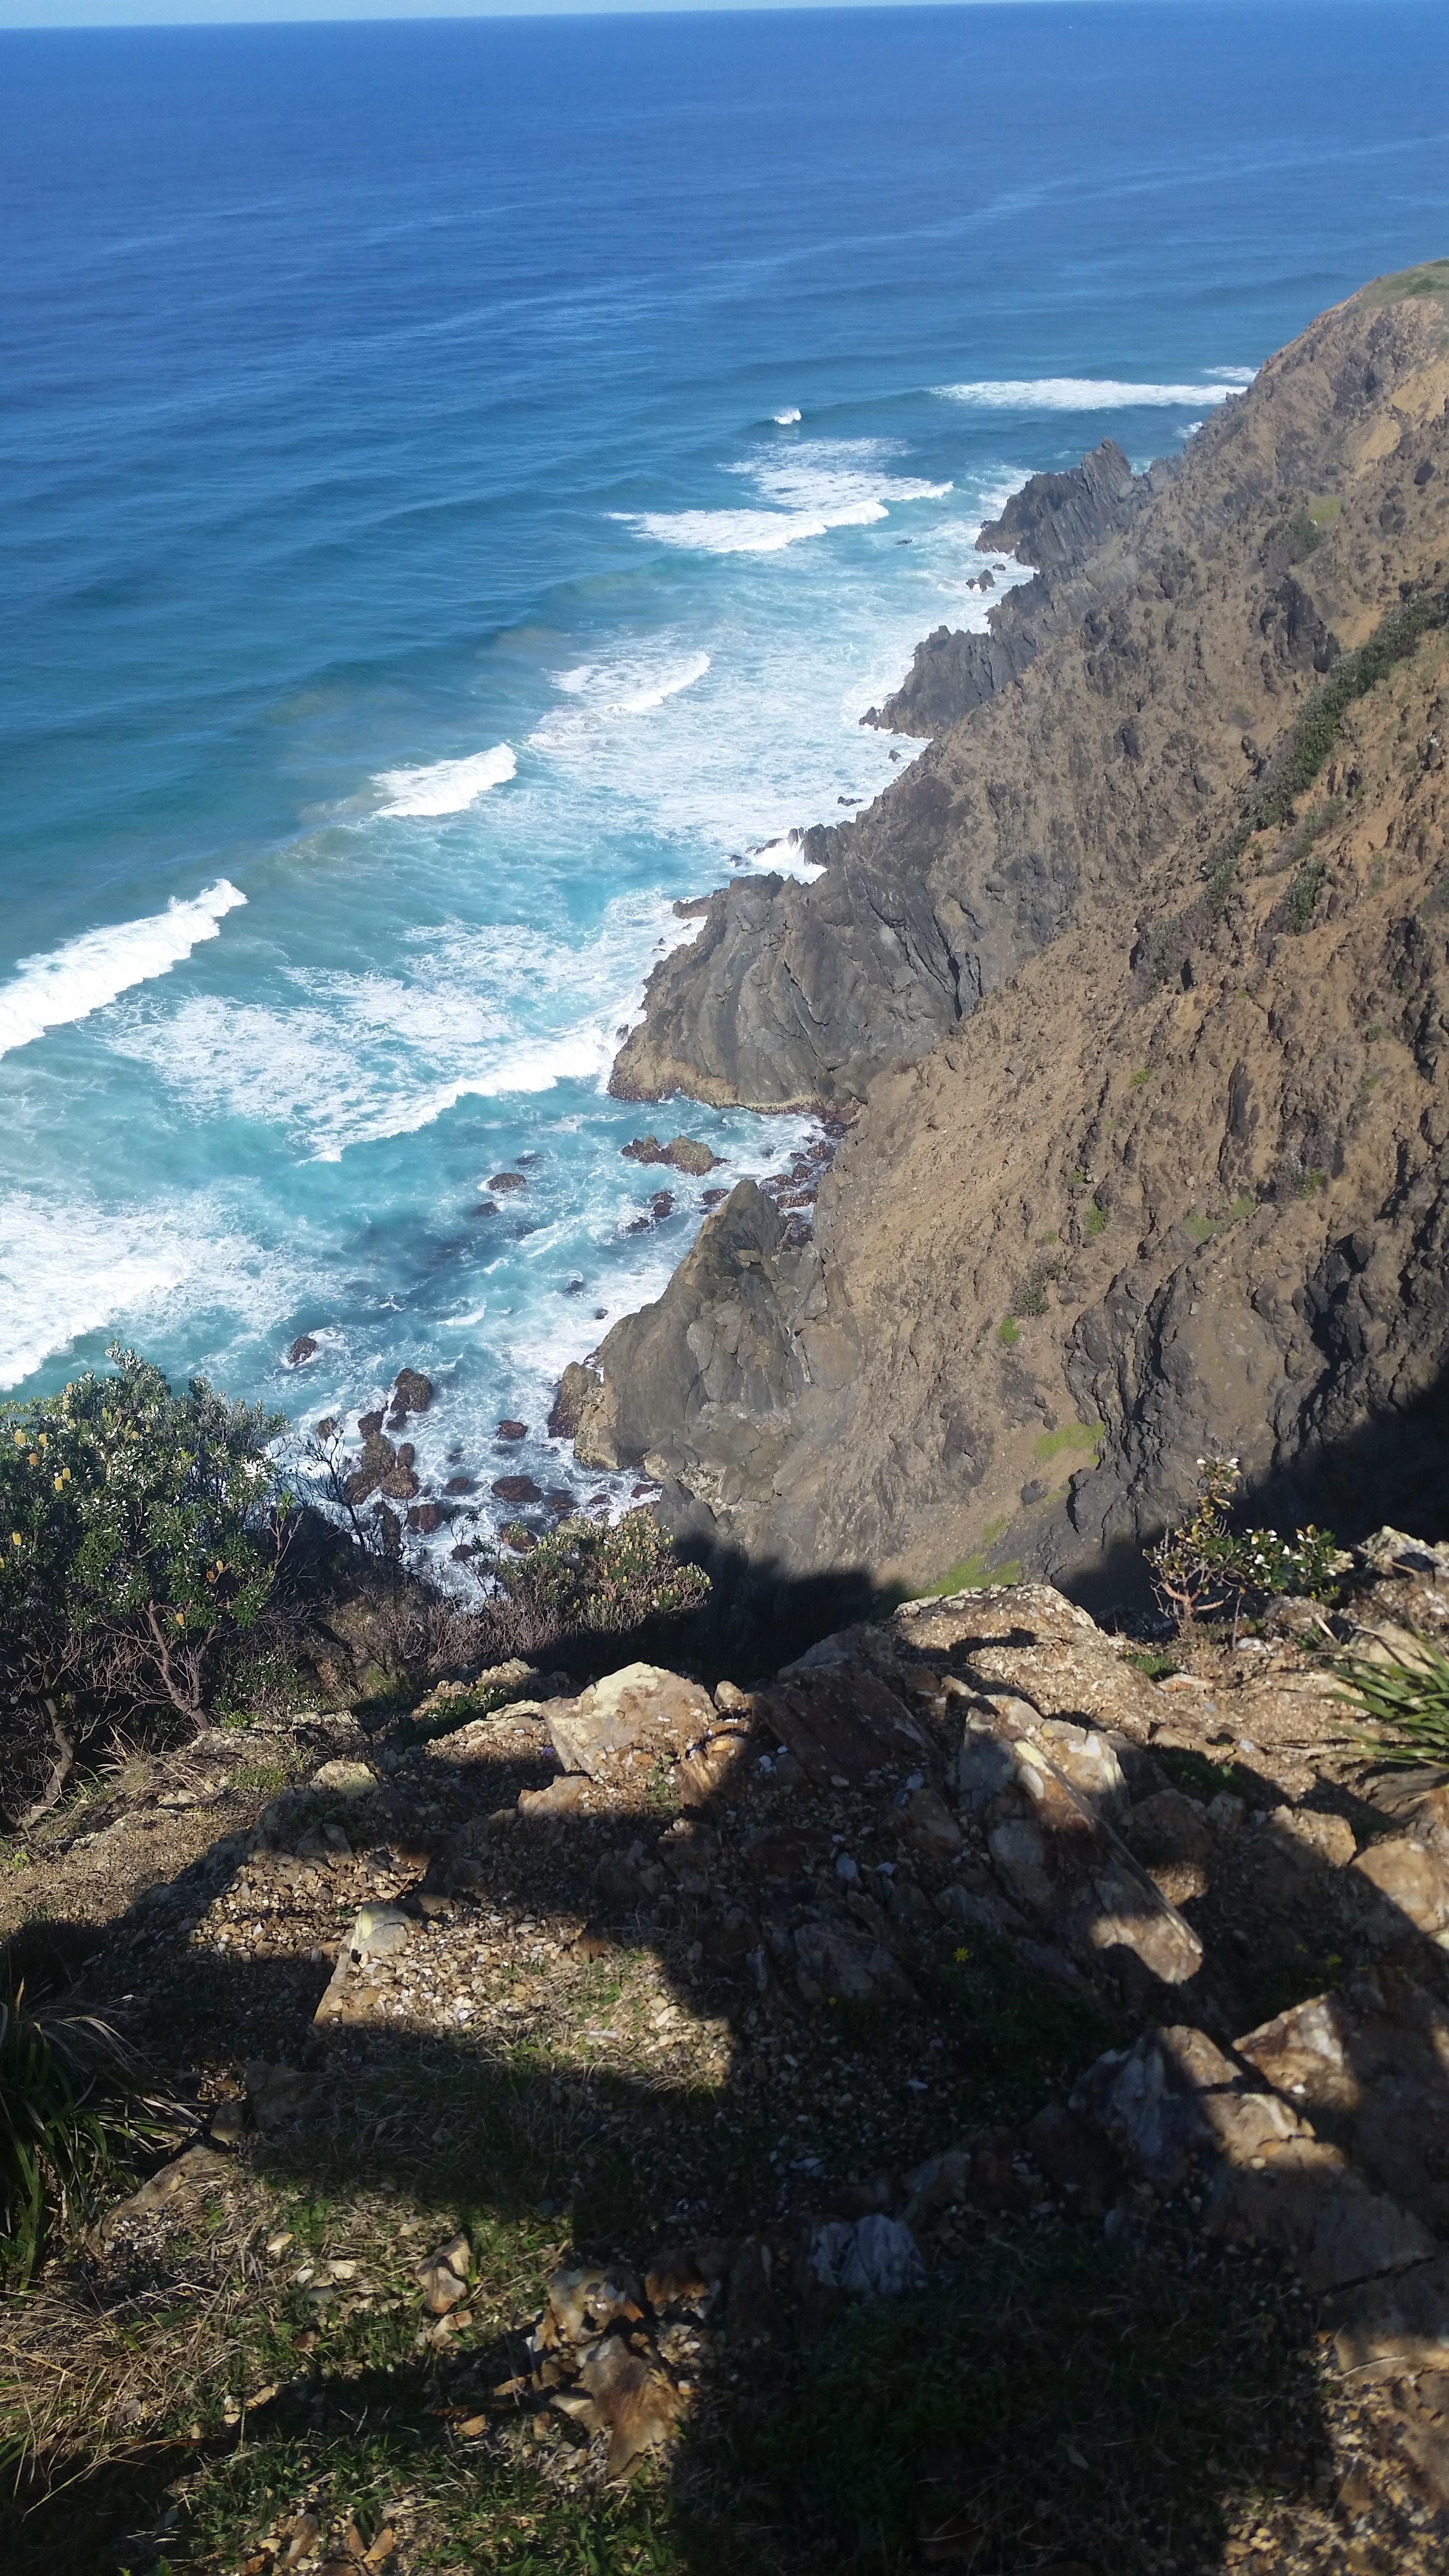 Tamara Smih Member for Ballina urges Protect Cape Byron Marine Park